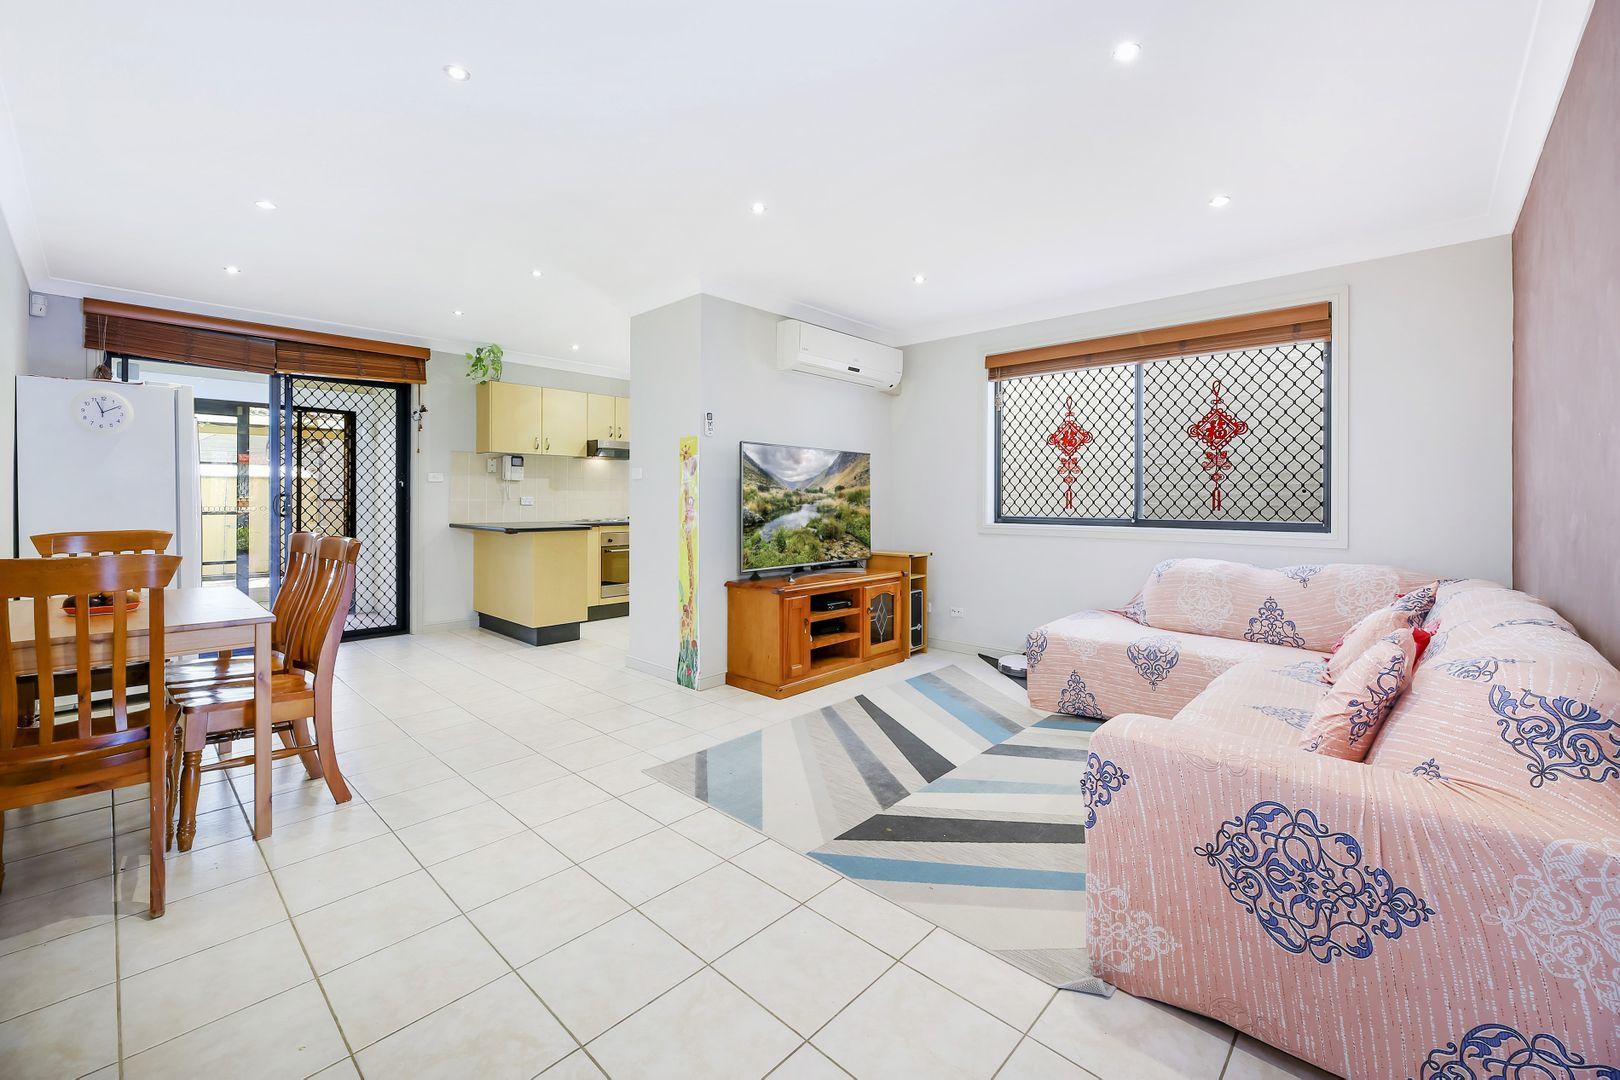 2/73 Buckingham Street, Canley Heights NSW 2166, Image 1